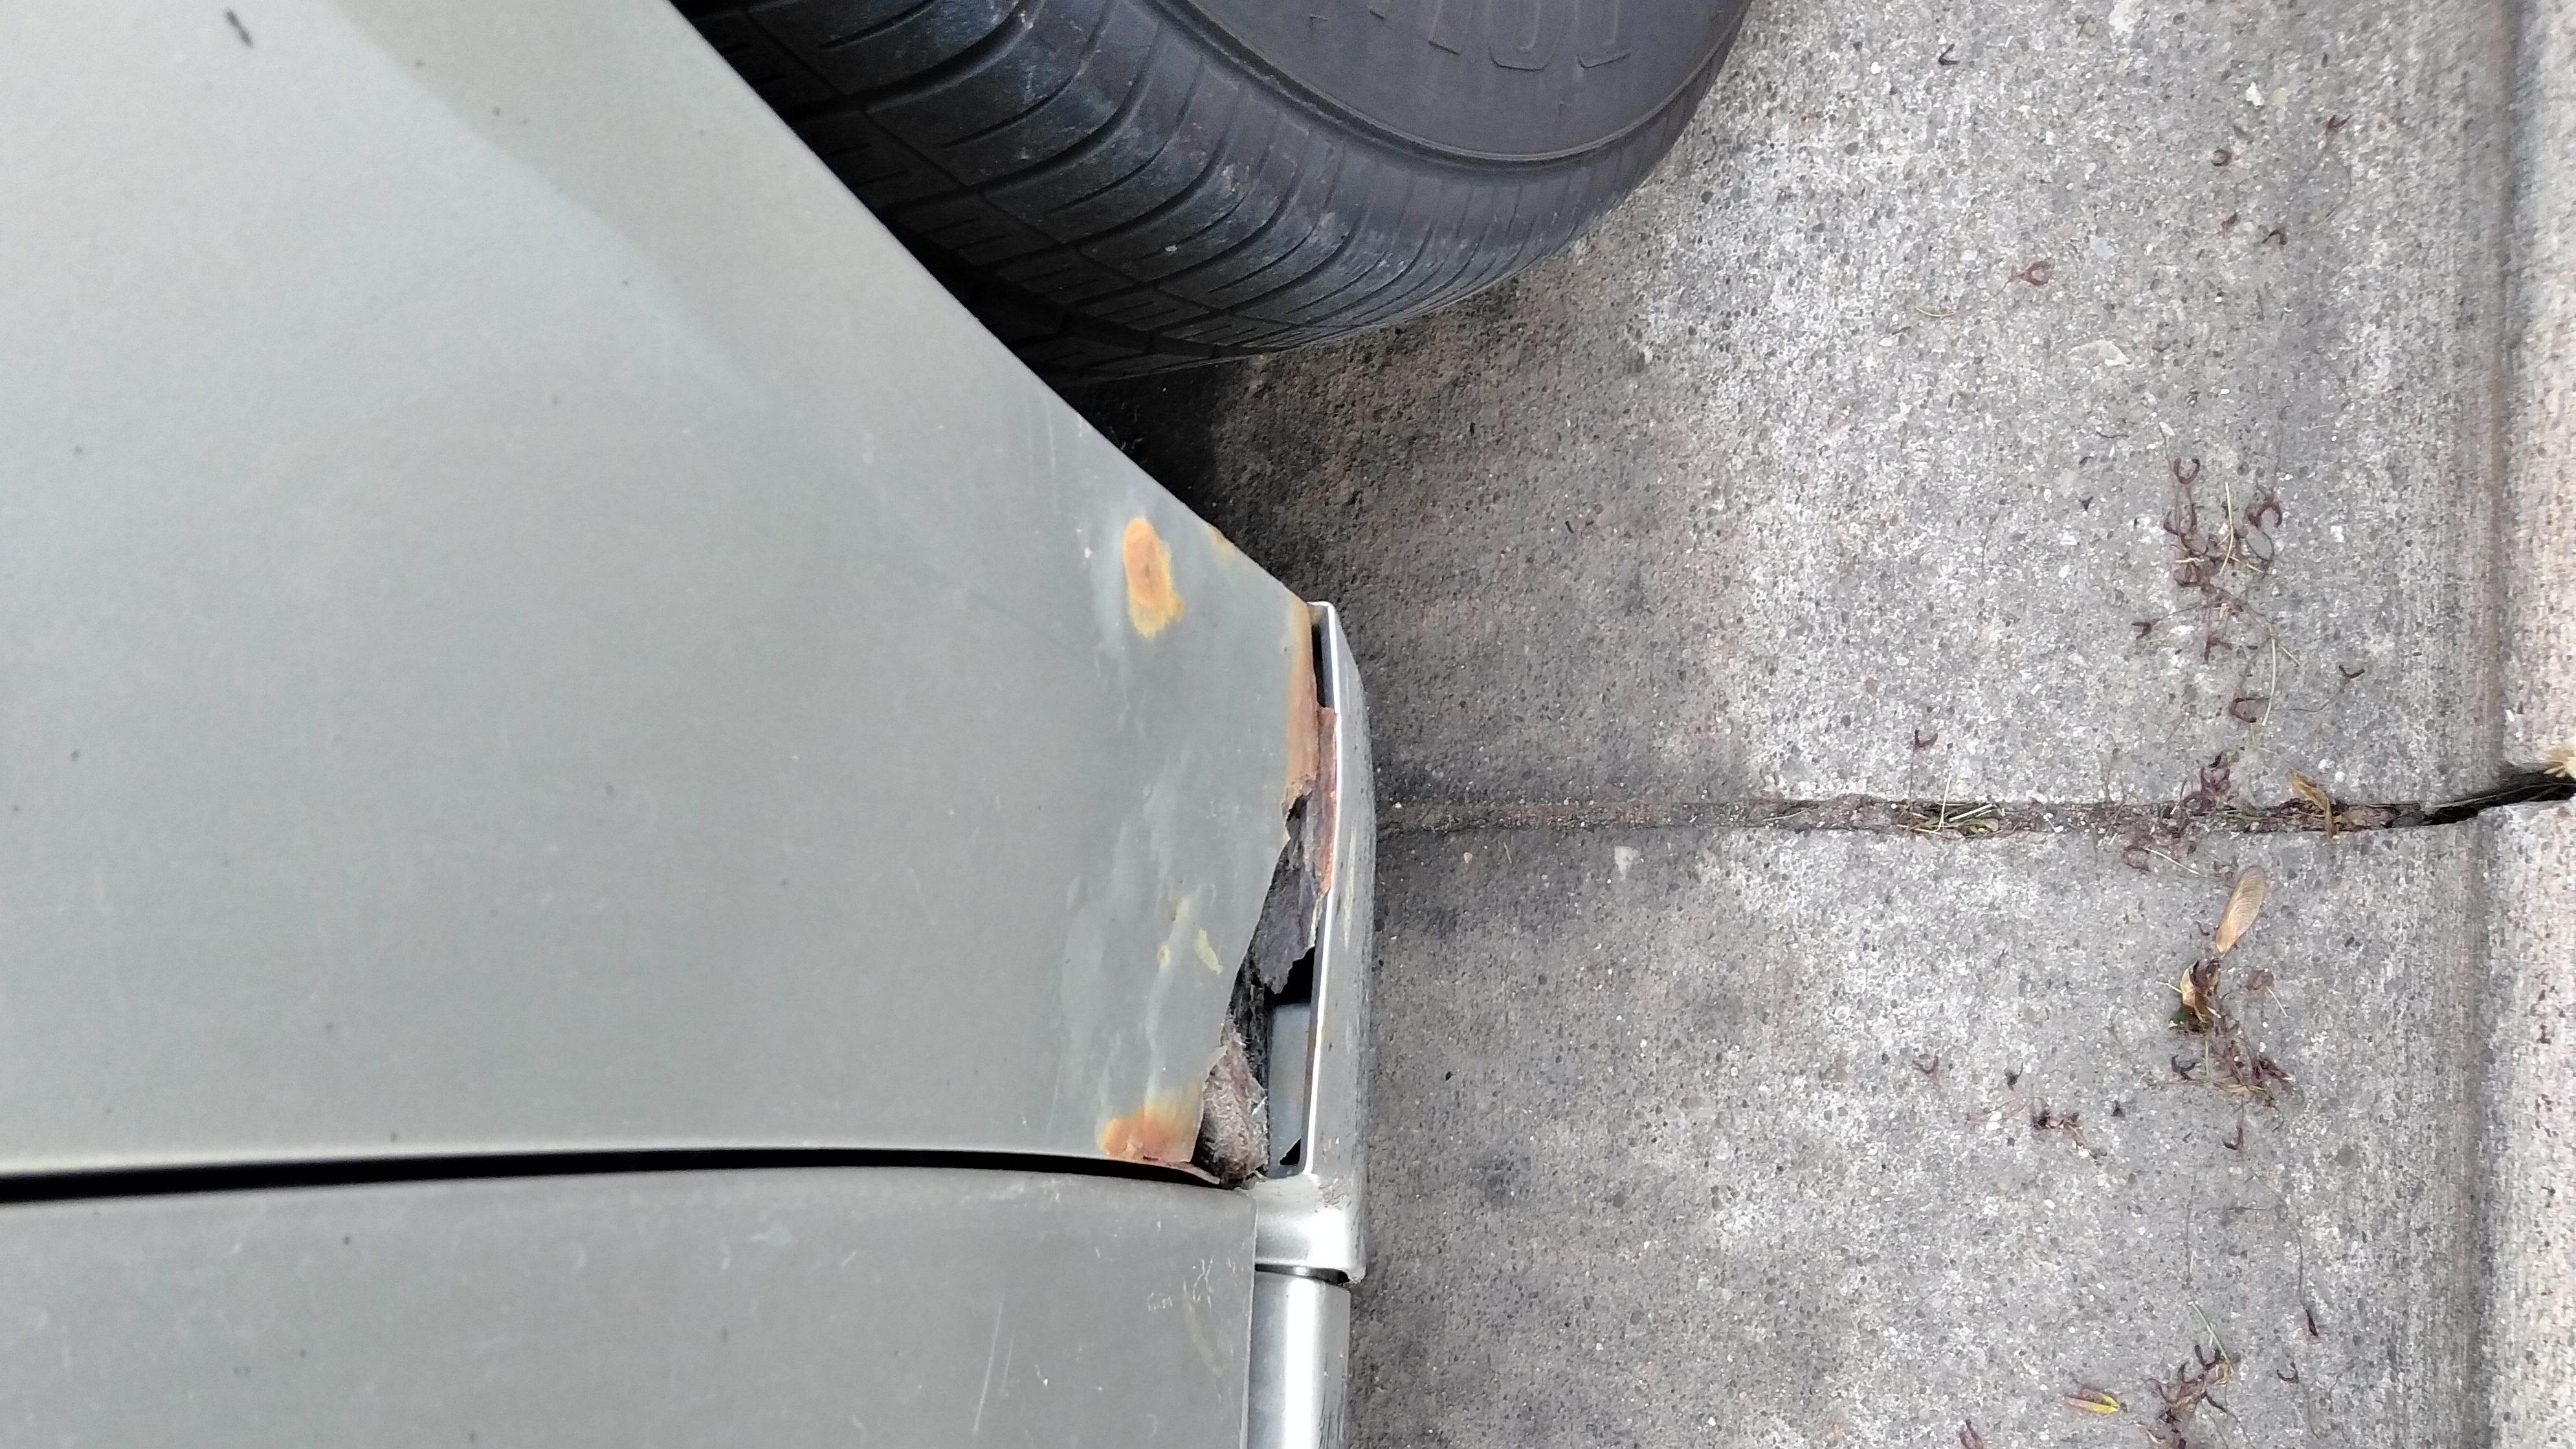 2006 chevy impala